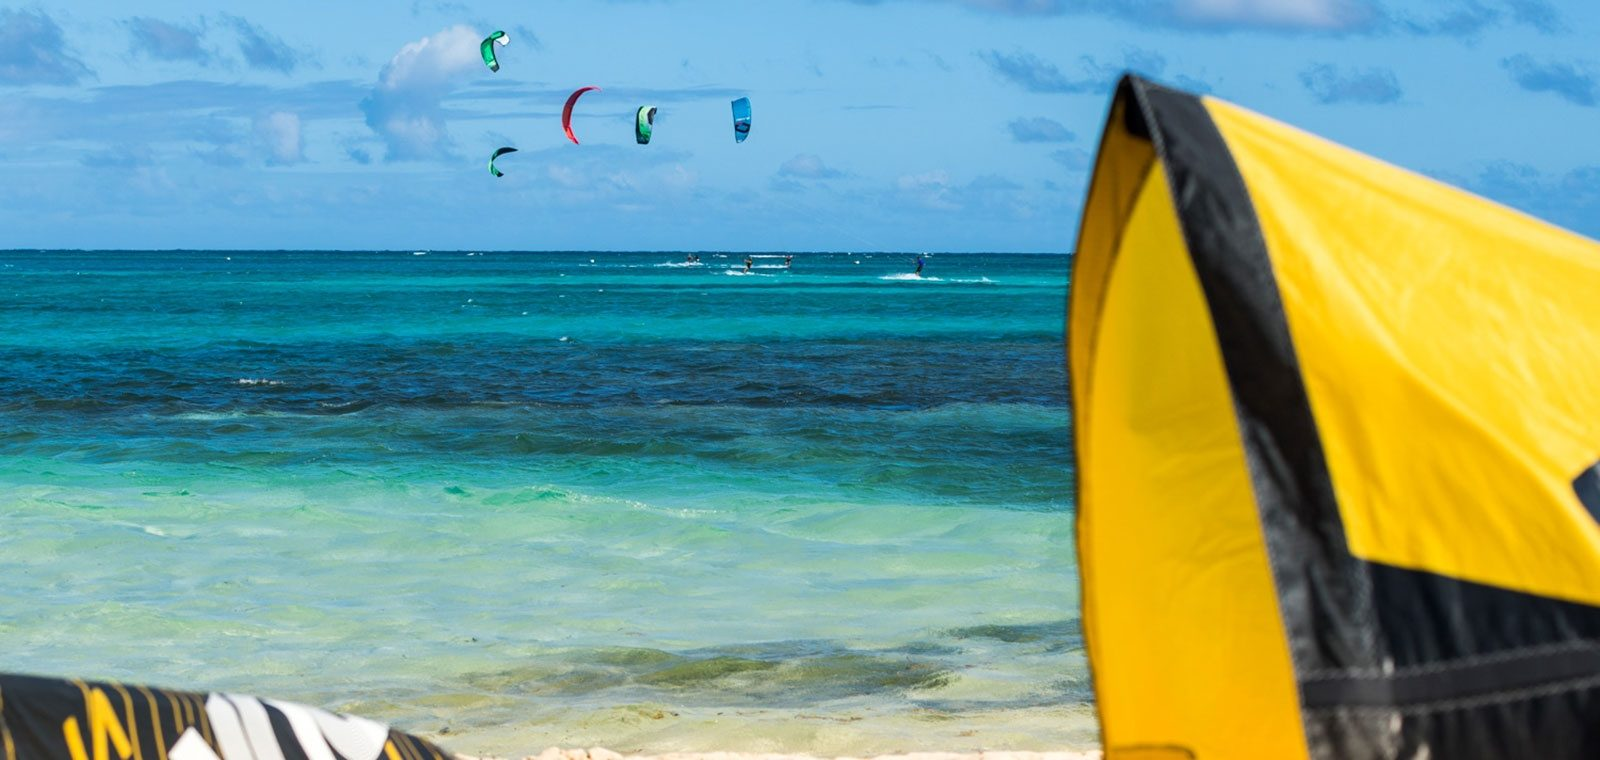 kitesurf spot at green island